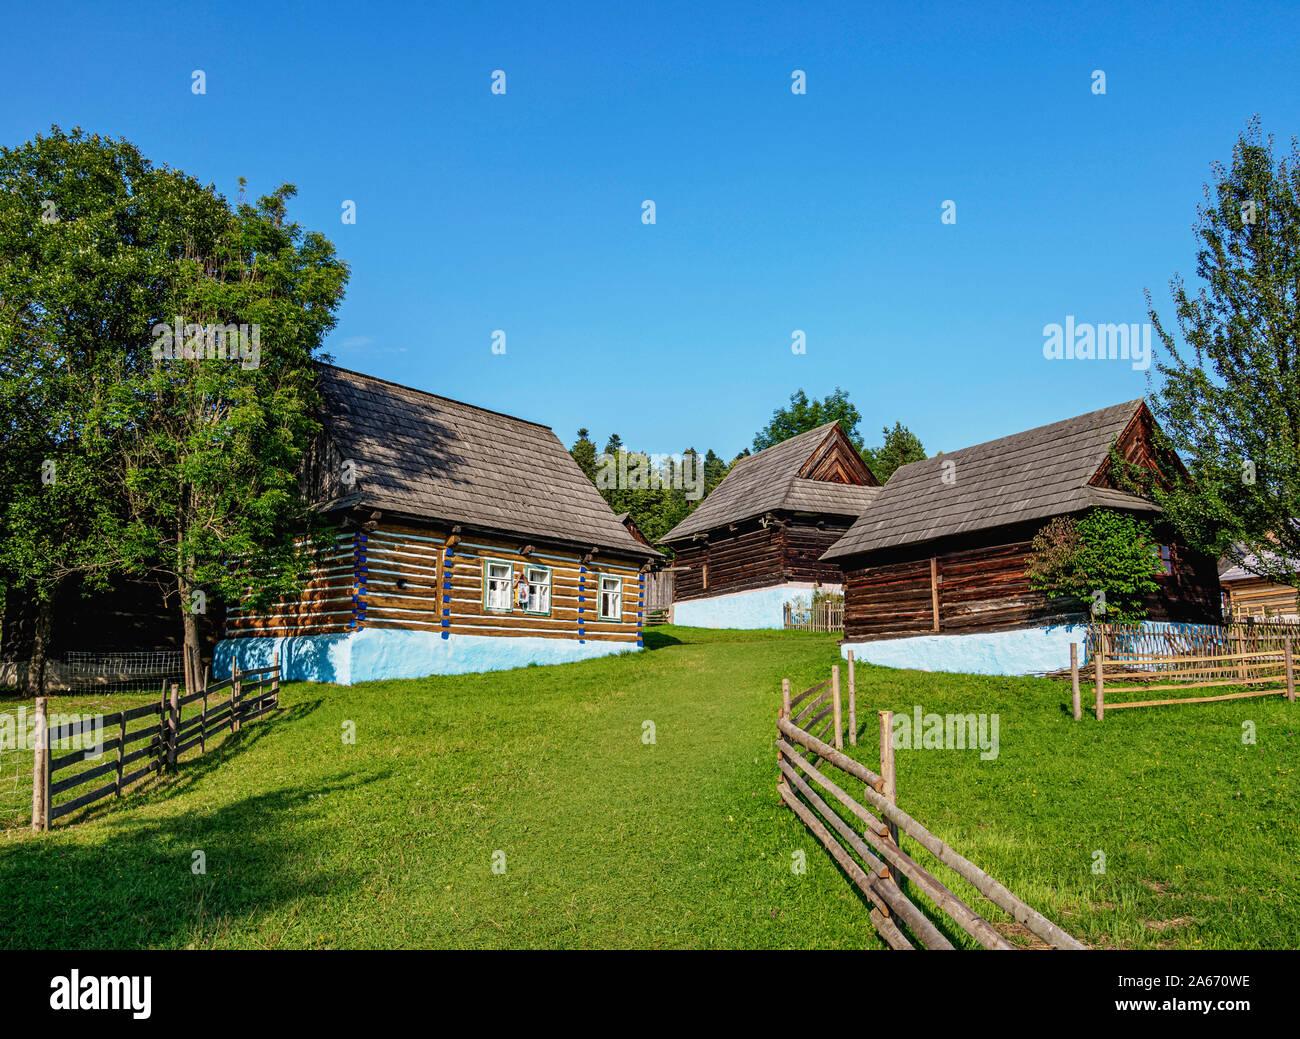 Open Air Museum in Stara Lubovna, Presov Region, Slowakei Stockfoto